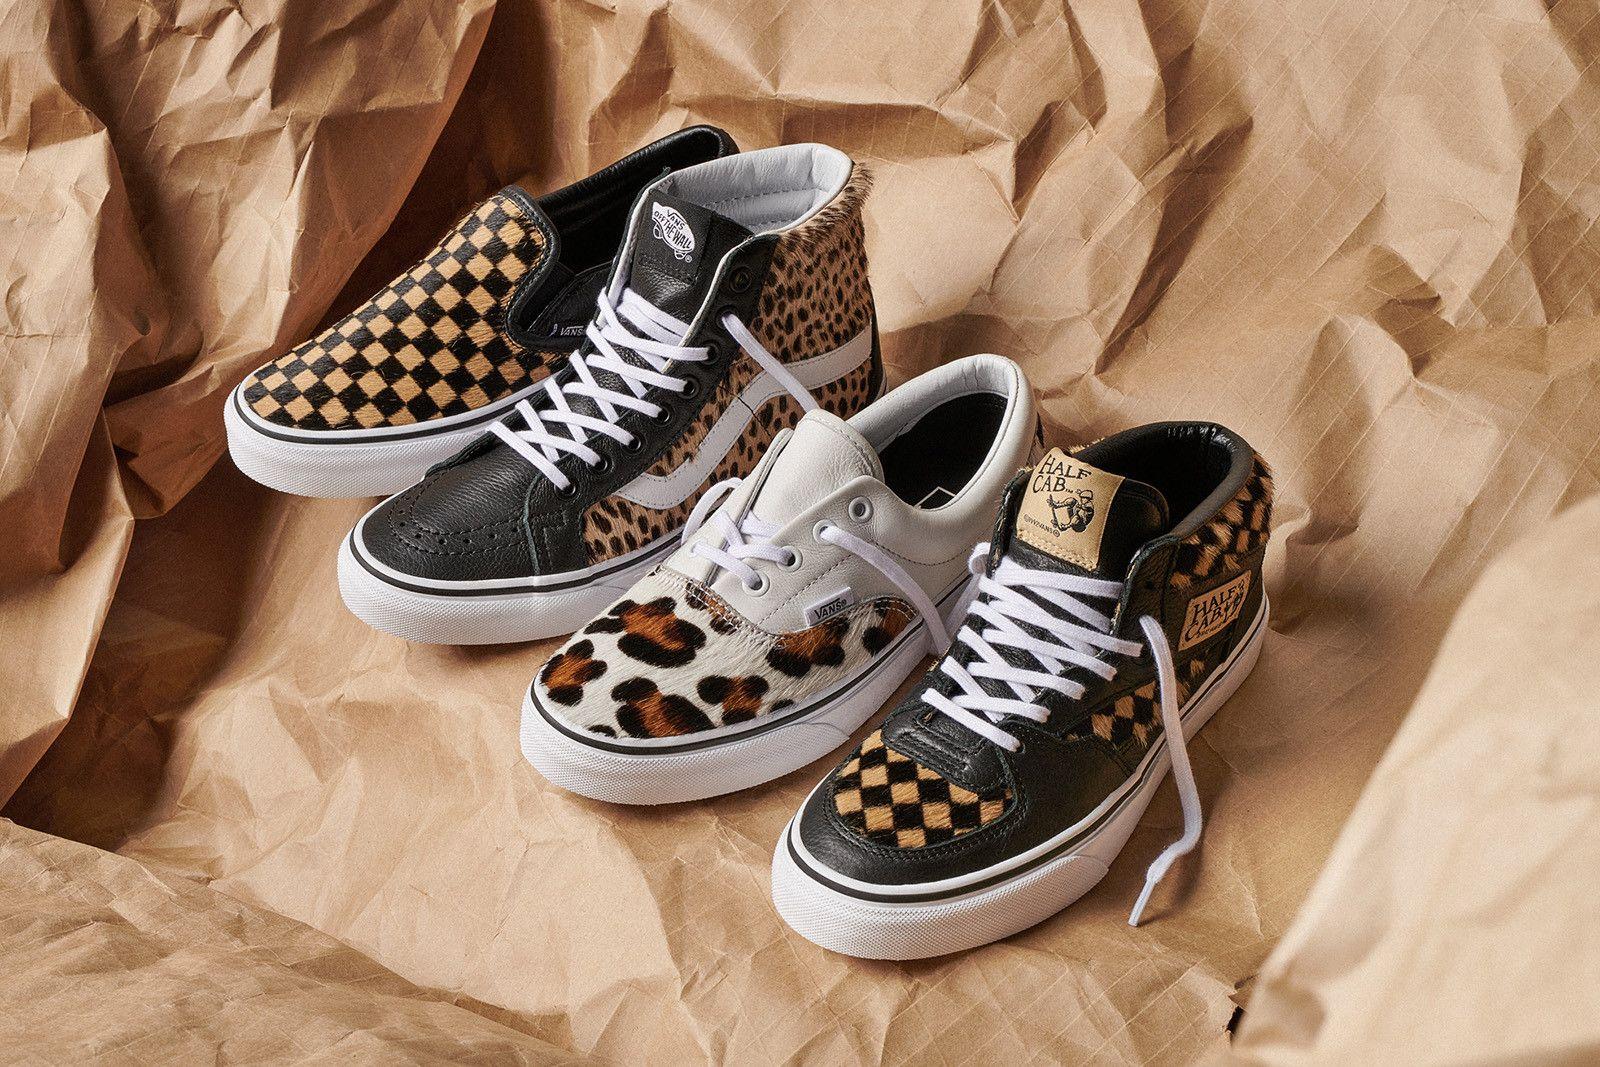 51b83a78ce3b5d Vans Unveil Calf Hair Classic Footwear Release Details Date Price Cop  Purchase Buy Shoes Trainers Sneakers Kicks Slip-On Half Cab Era Sk8-Hi  Cheetah Leopard ...